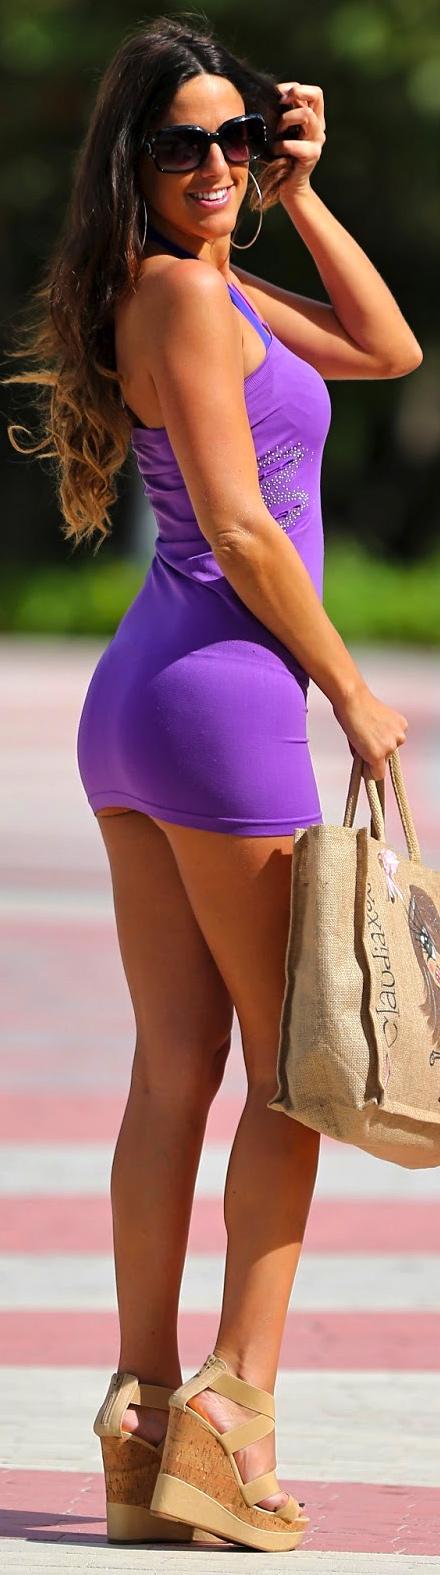 Claudia Romani Photos in Purple Mini Dress Leaving her apartment in Miami Beach CelebsNext 0003-1